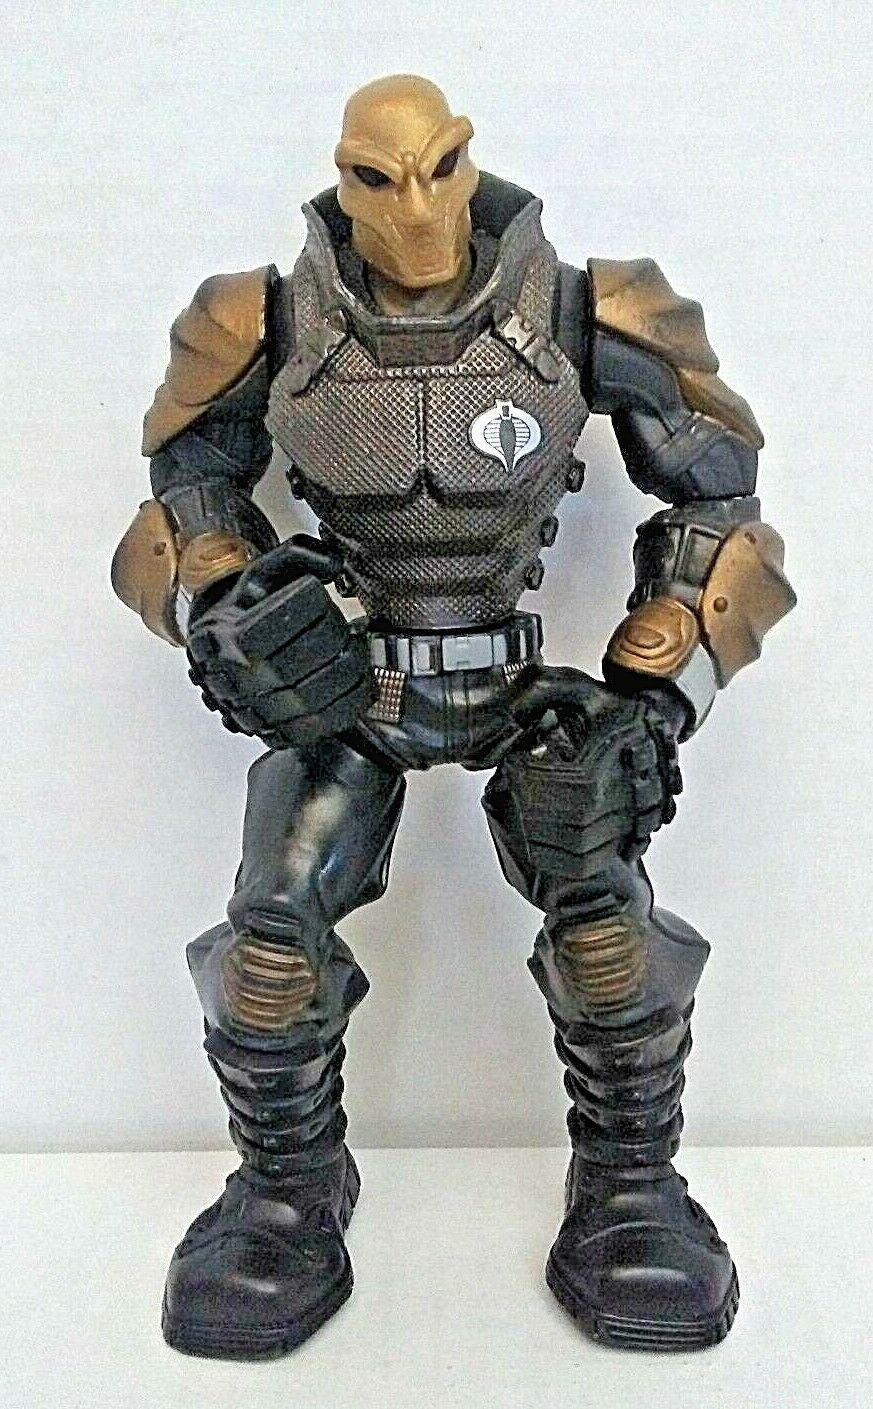 GI Joe Action Battlers Cobra Viper Commando Action Figures Toys 2008 Hasbro